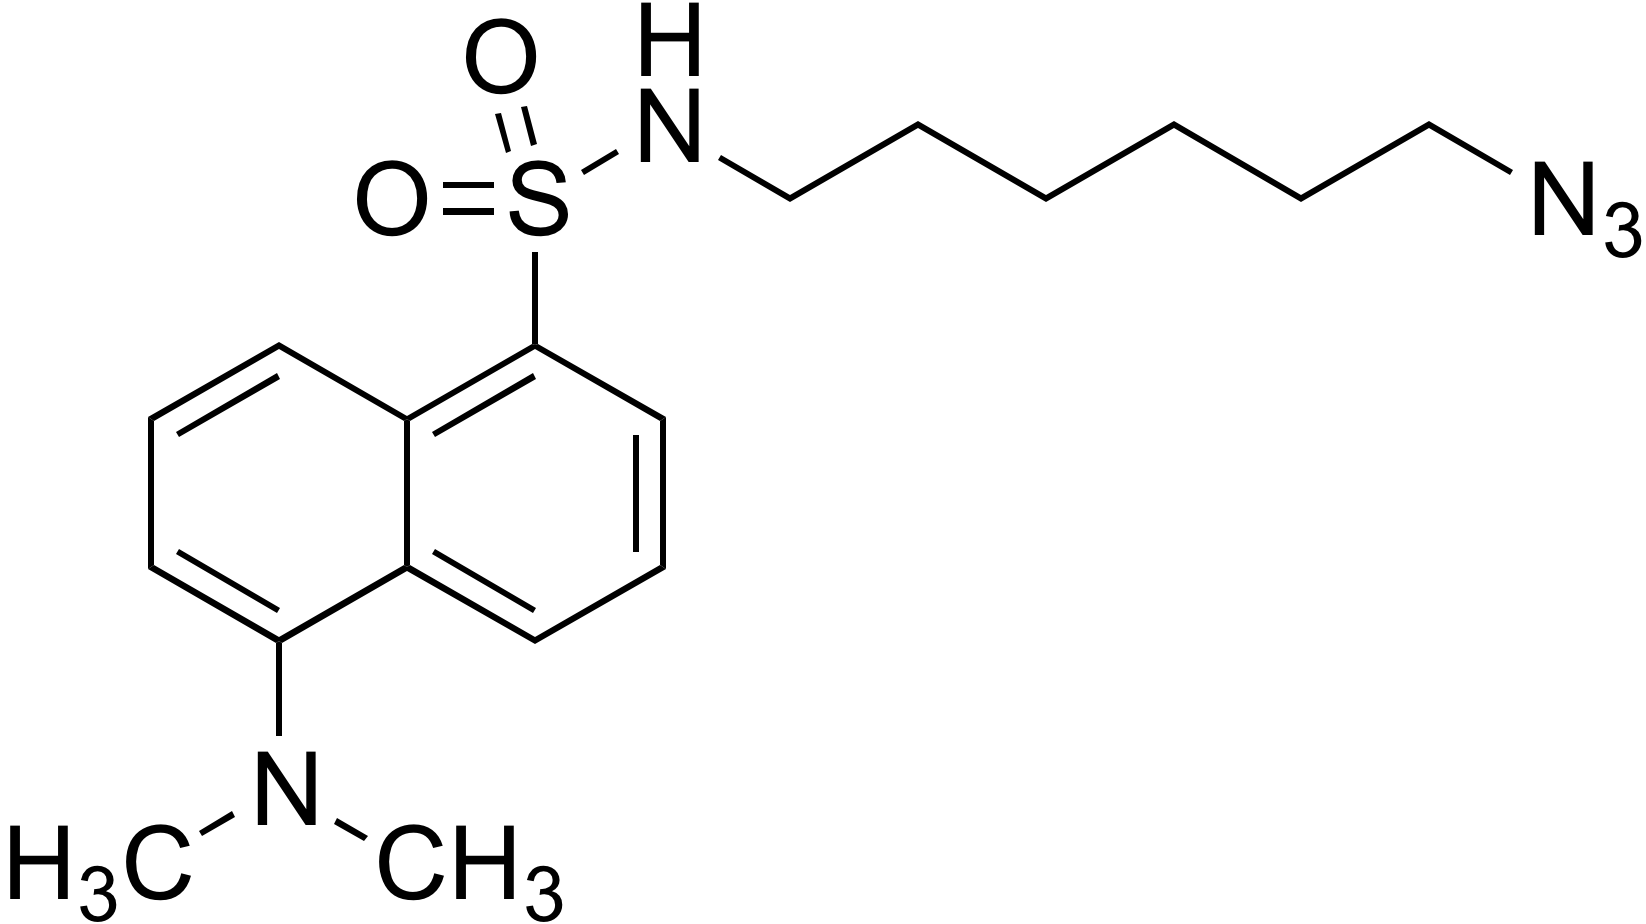 6-Azido-1-N-dansylhexylamine